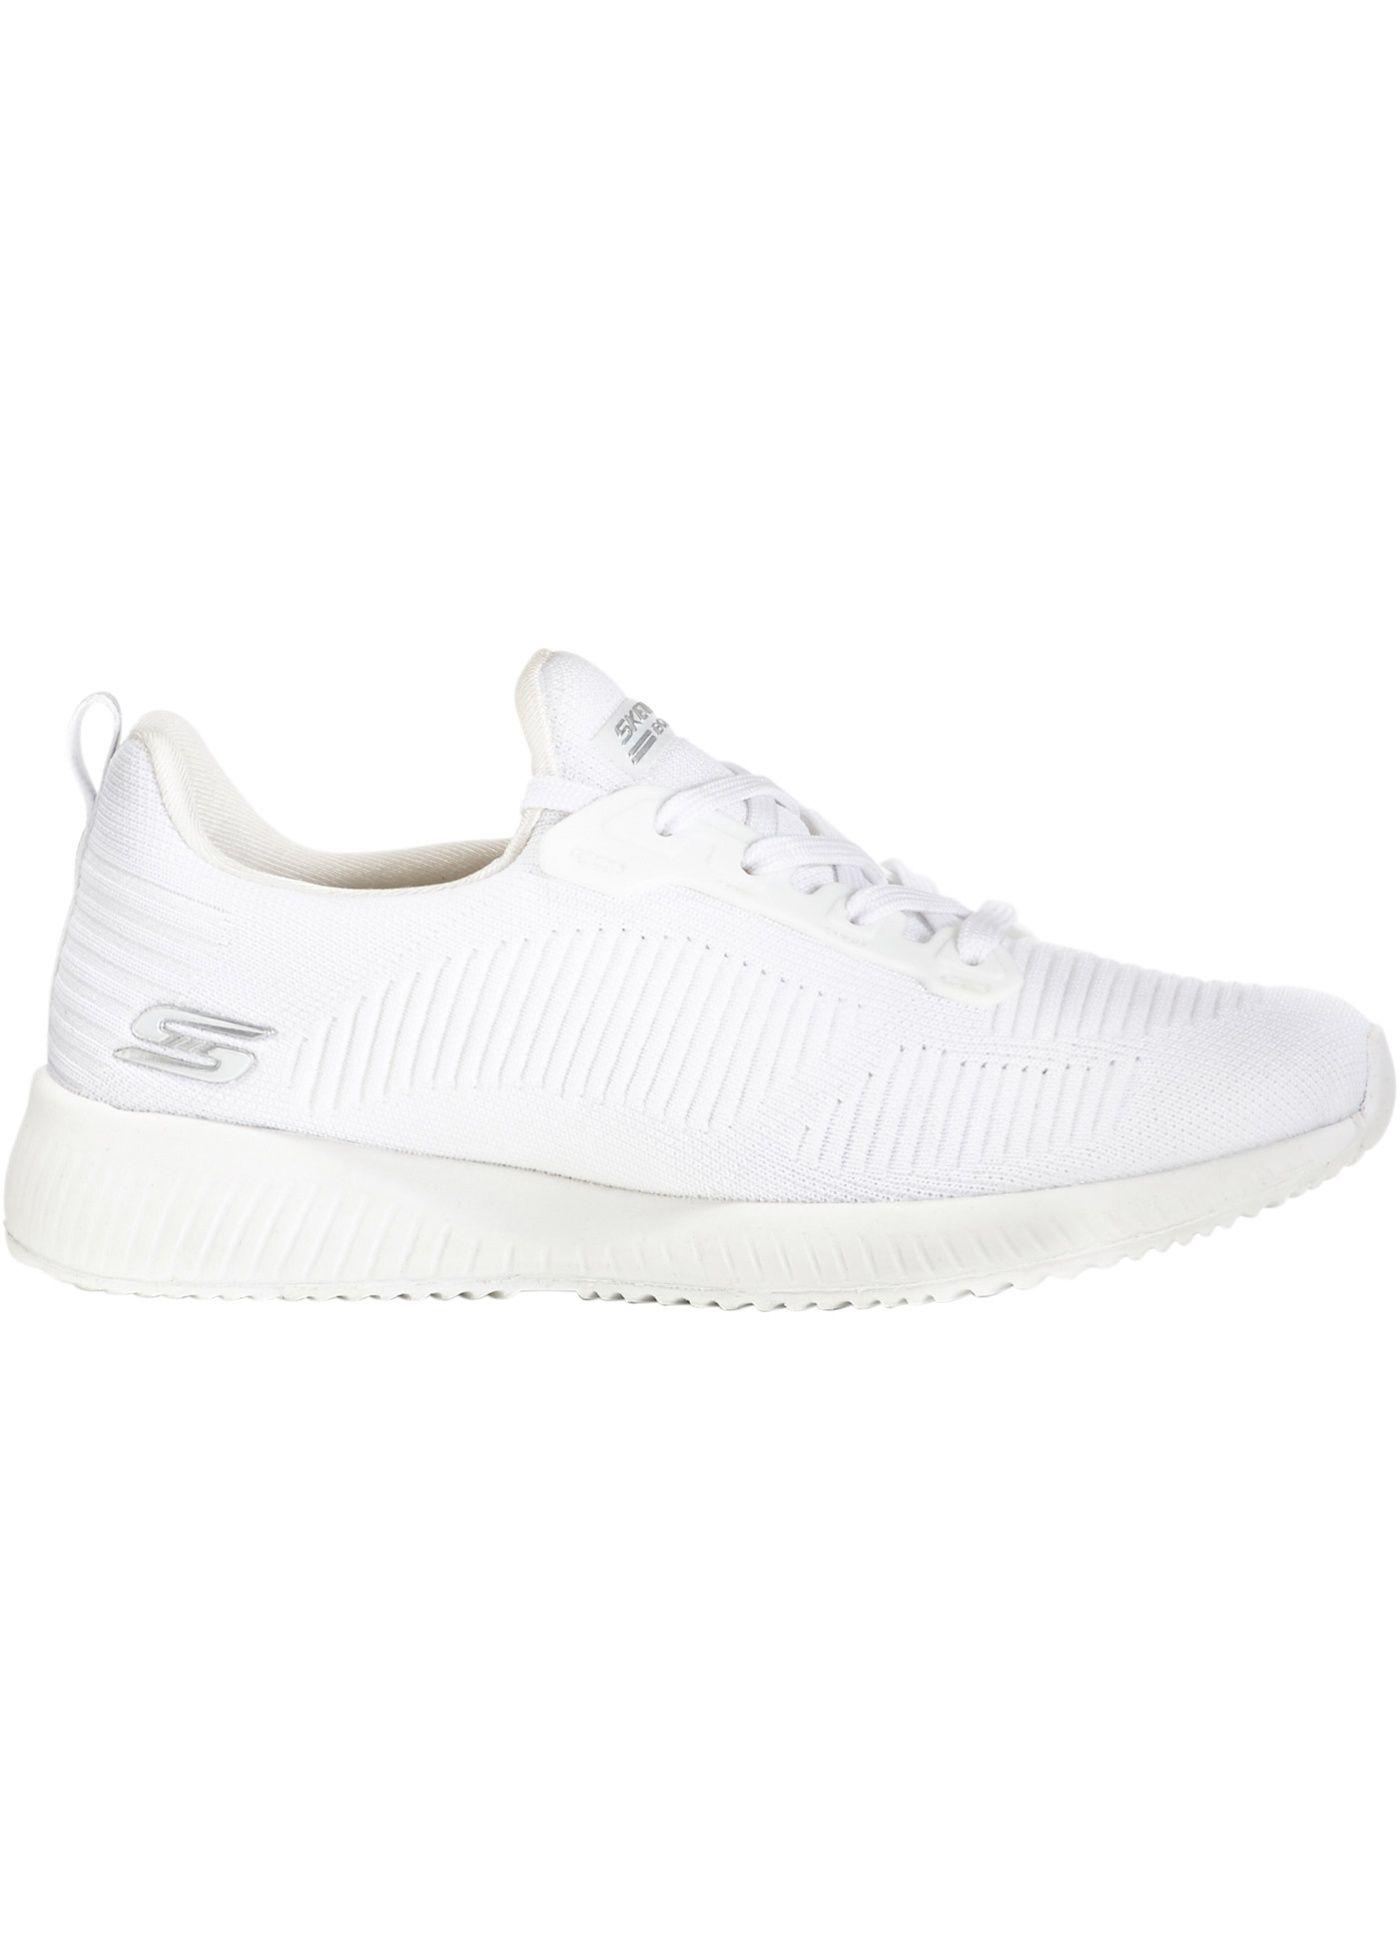 Skechers Damen Sneaker You | OTTO'S Onlineshop